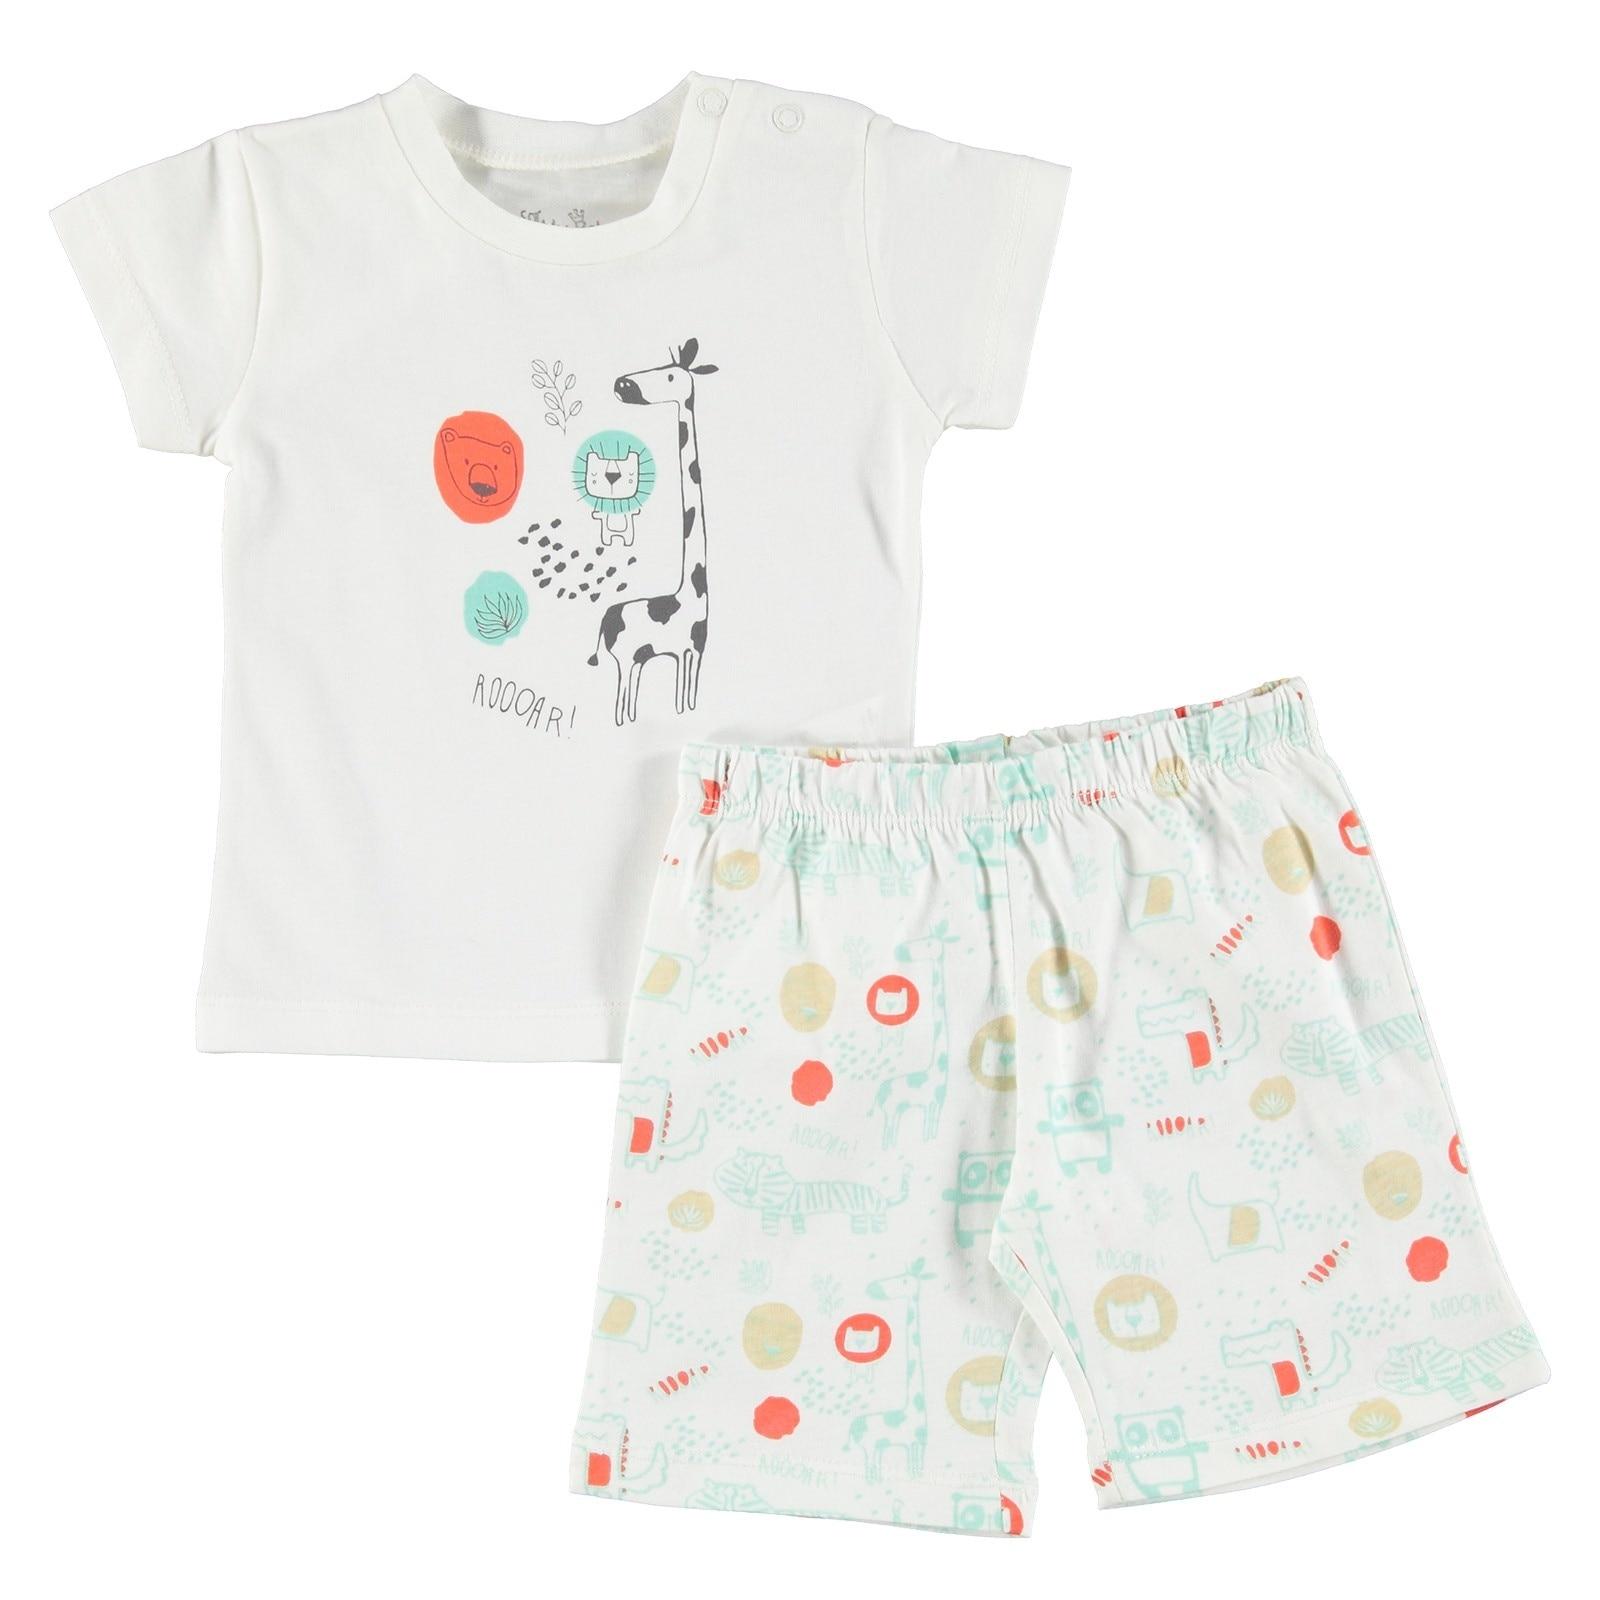 Ebebek For My Baby Boy Lion Printed Short SleevePyjamas